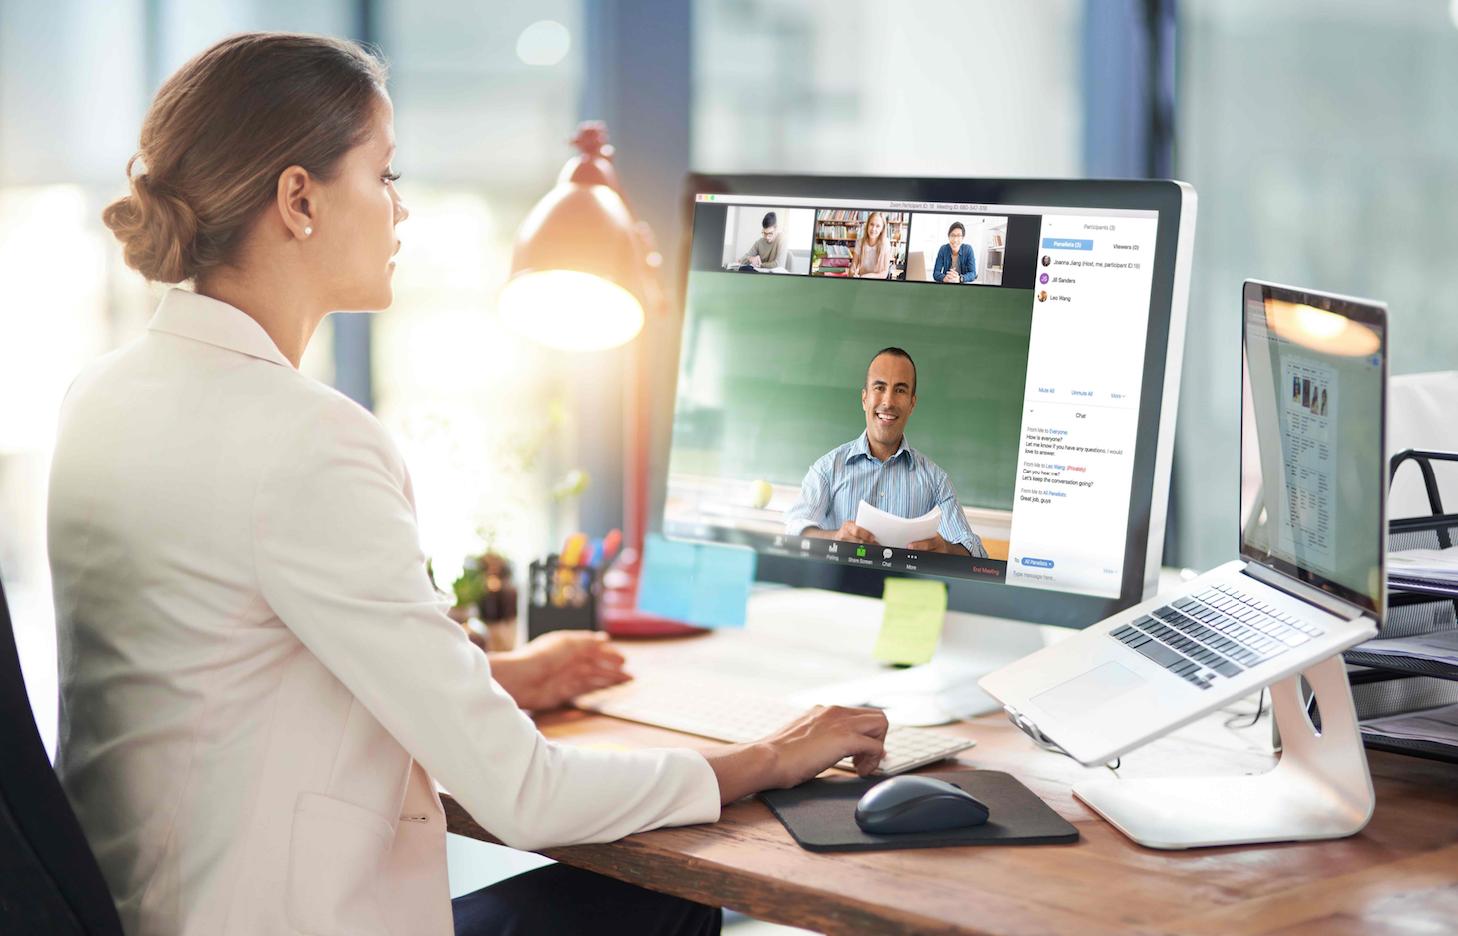 Zoom video webinars - easy to share